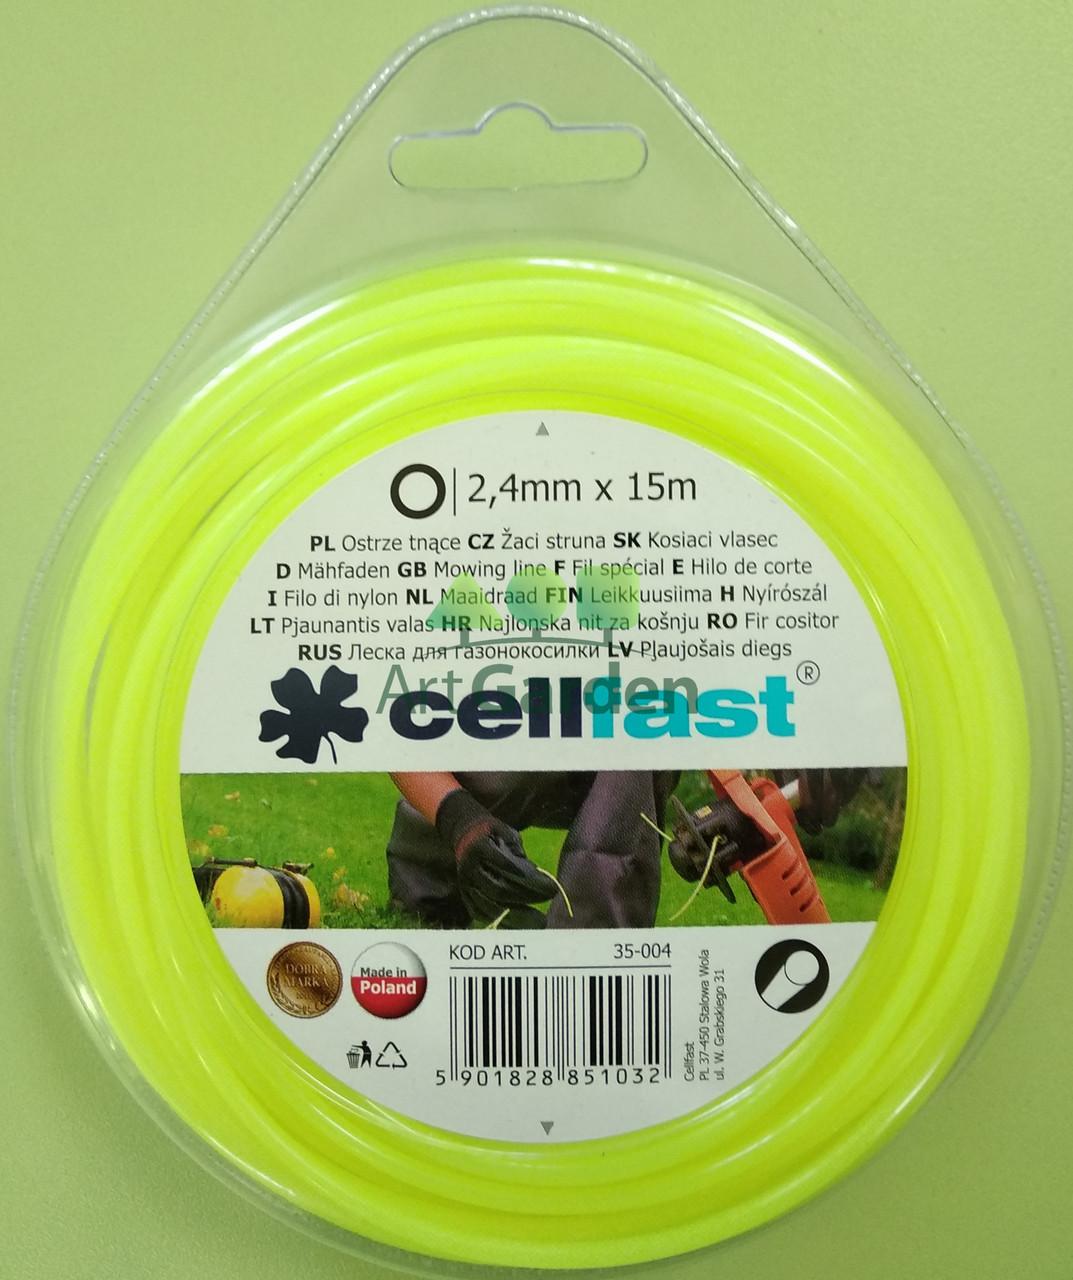 Лісочка для тріммера Cell Fast 2.4 mm